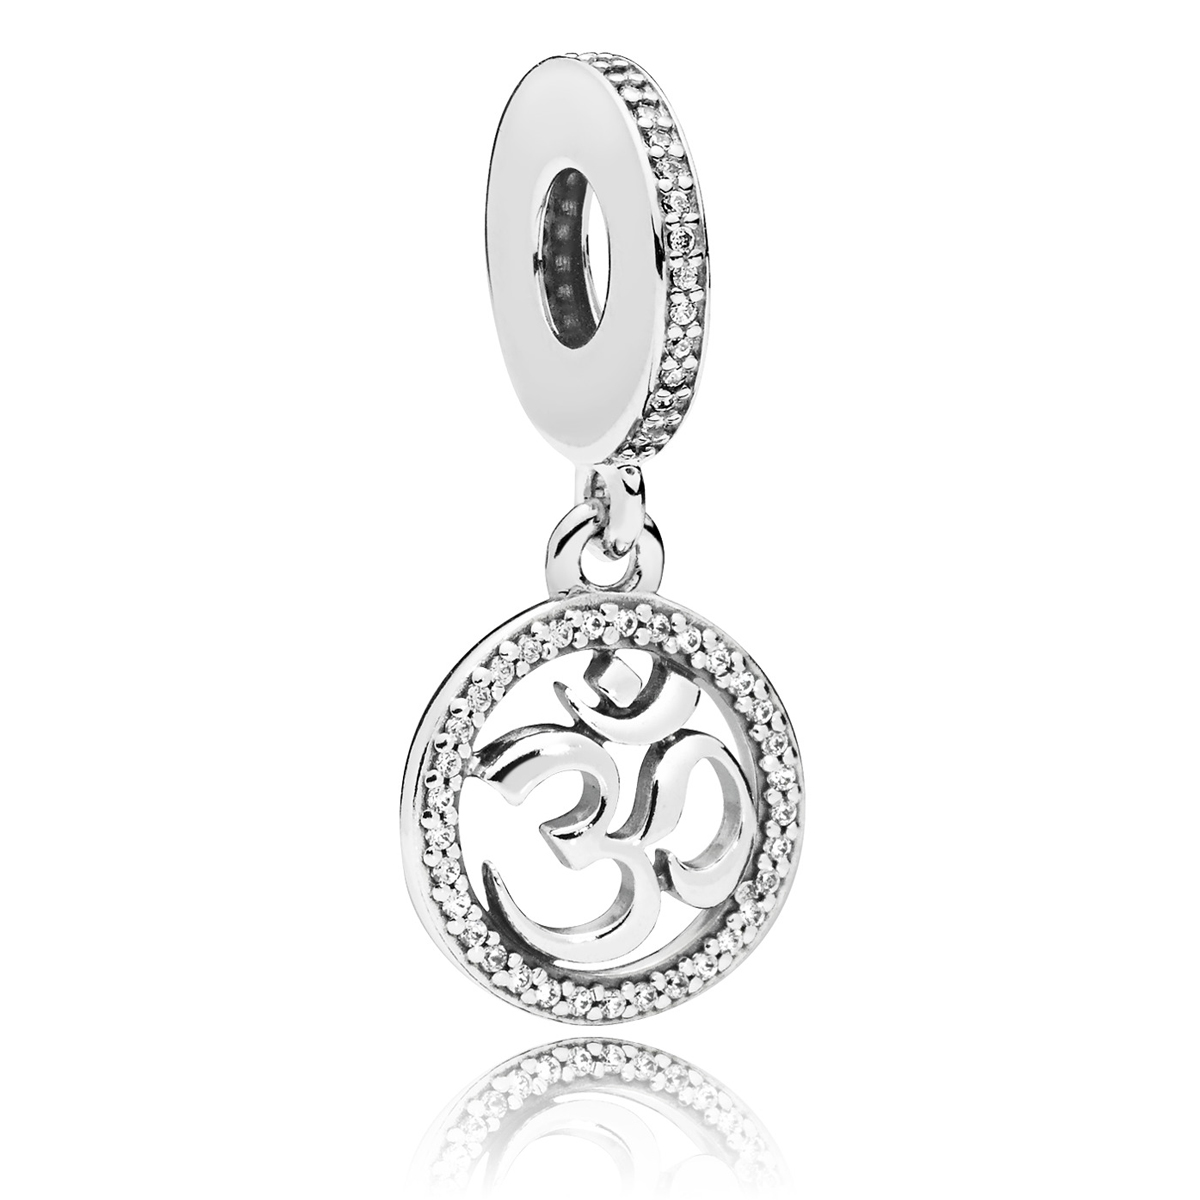 Pandora Sterling Silver Charms Pancharmbracelets